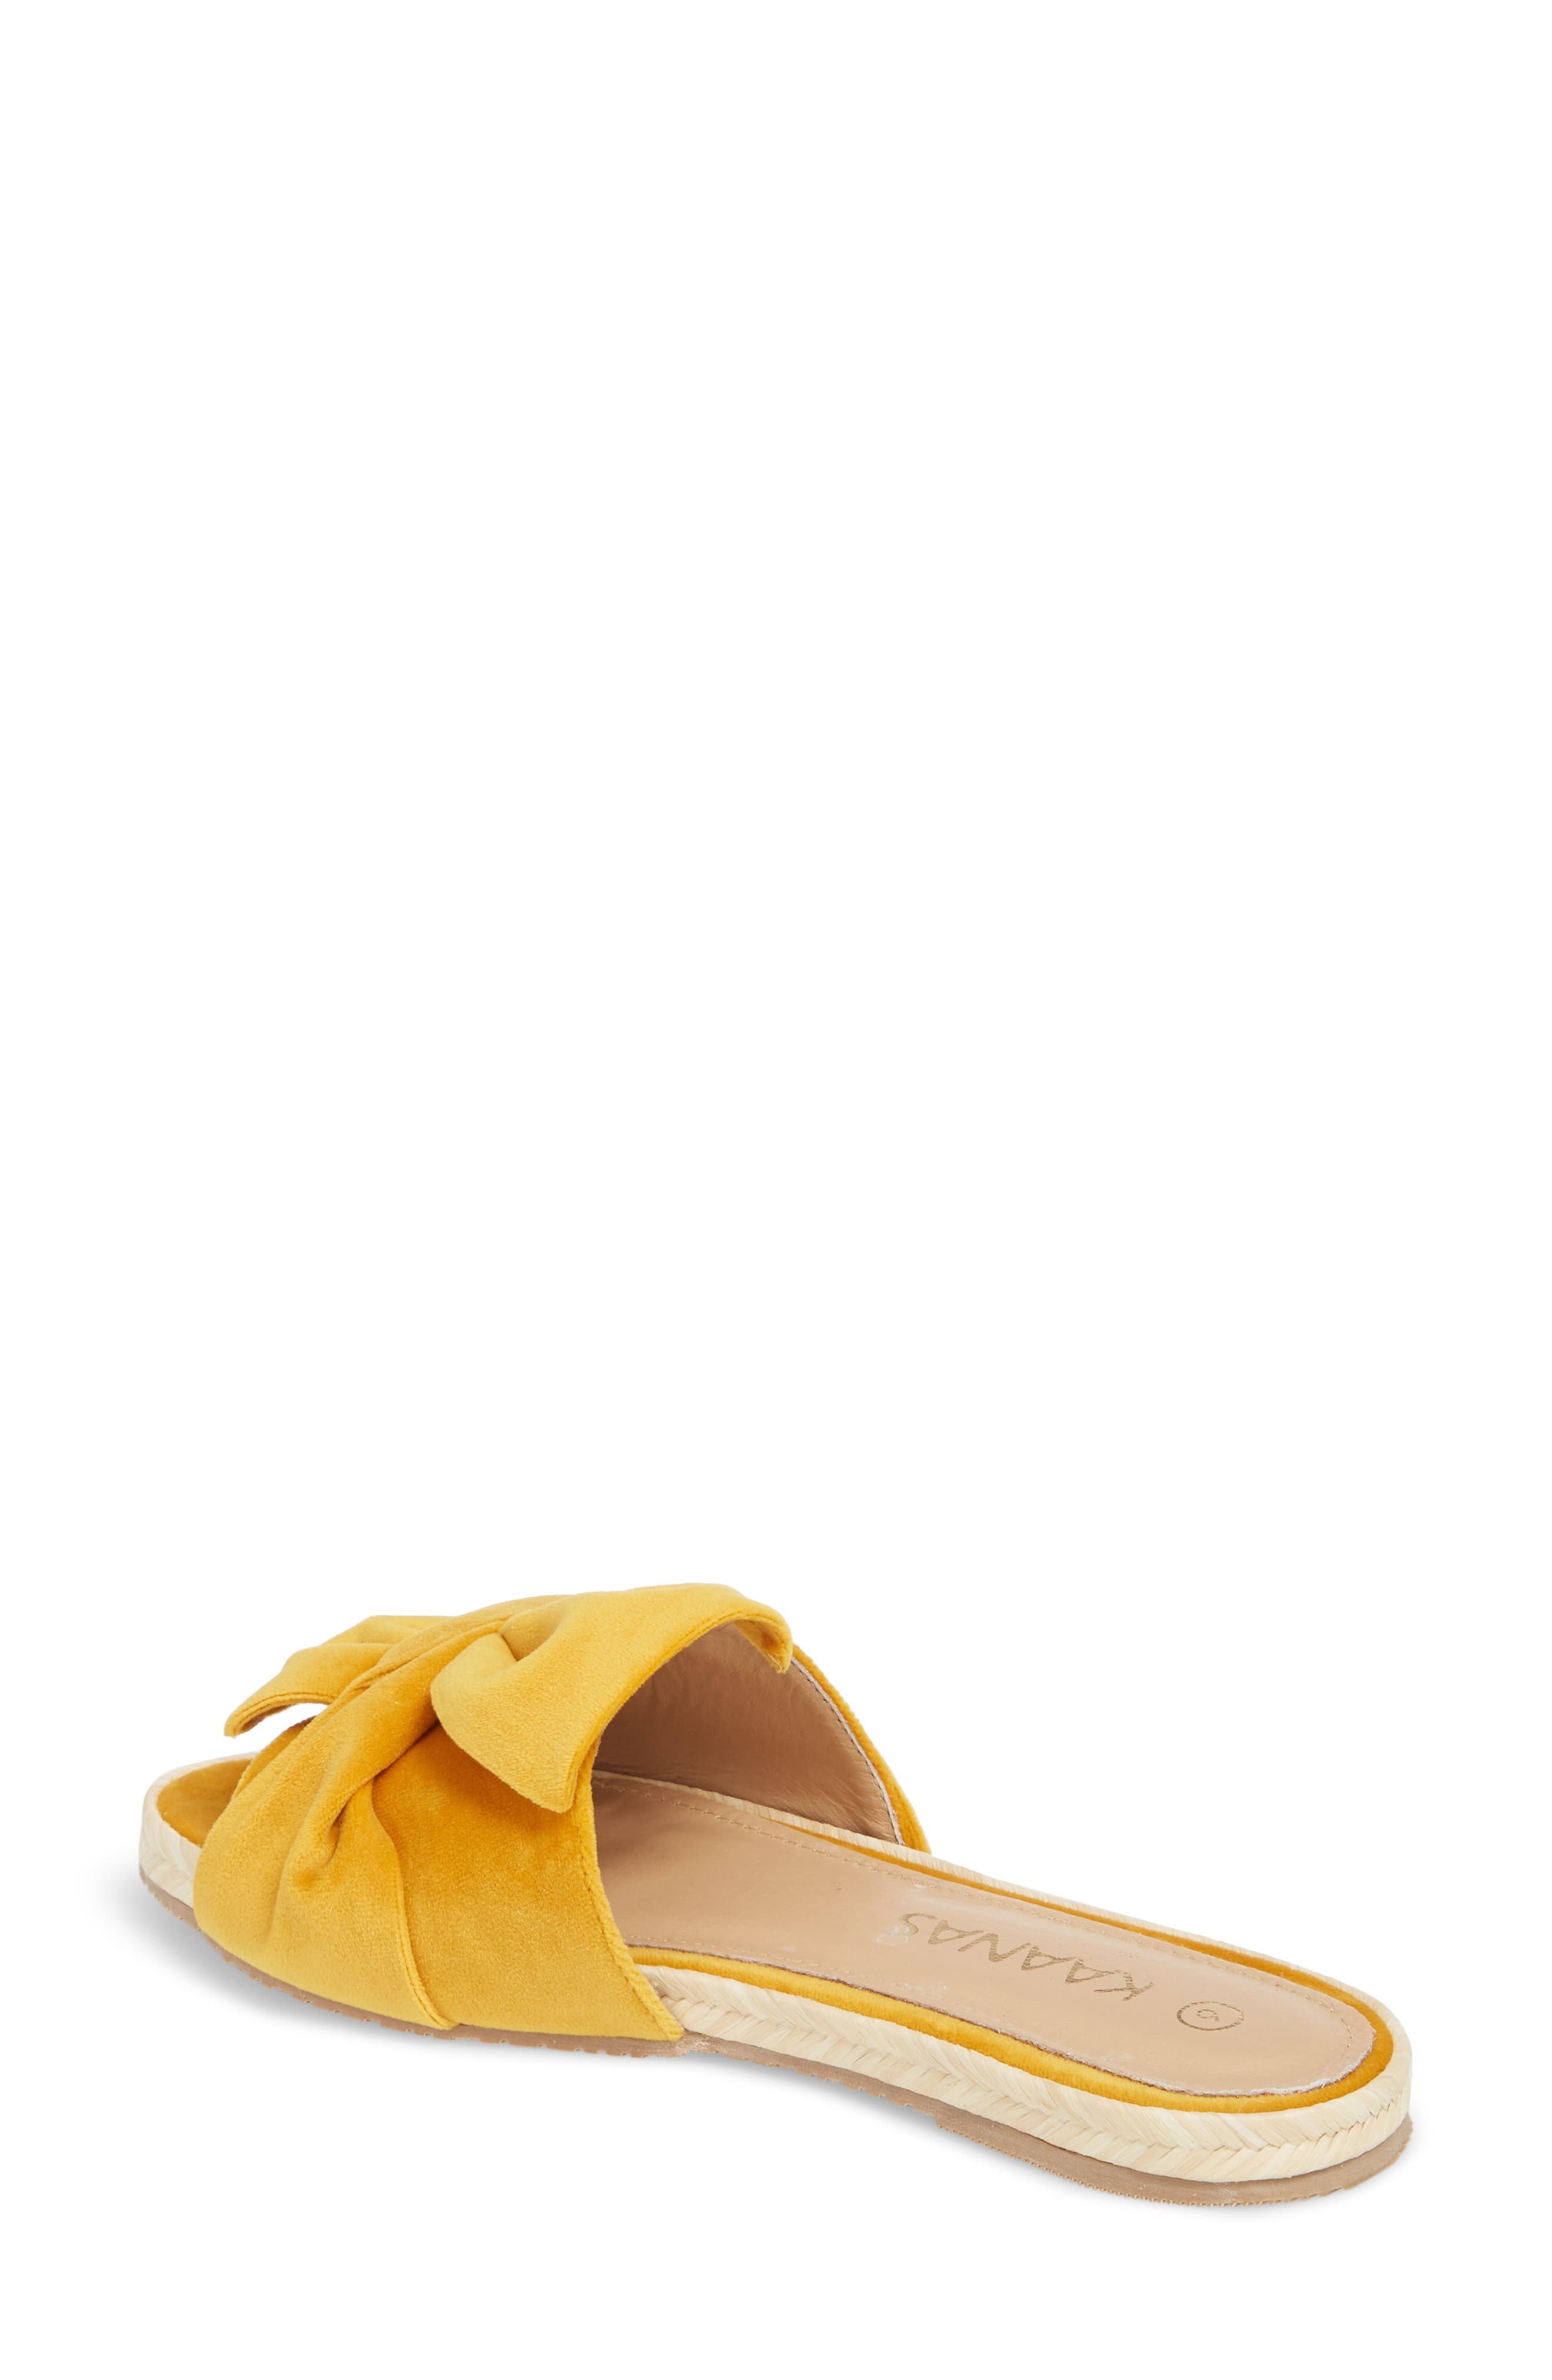 Sausalito Knotted Slide Sandal,                             Alternate thumbnail 4, color,